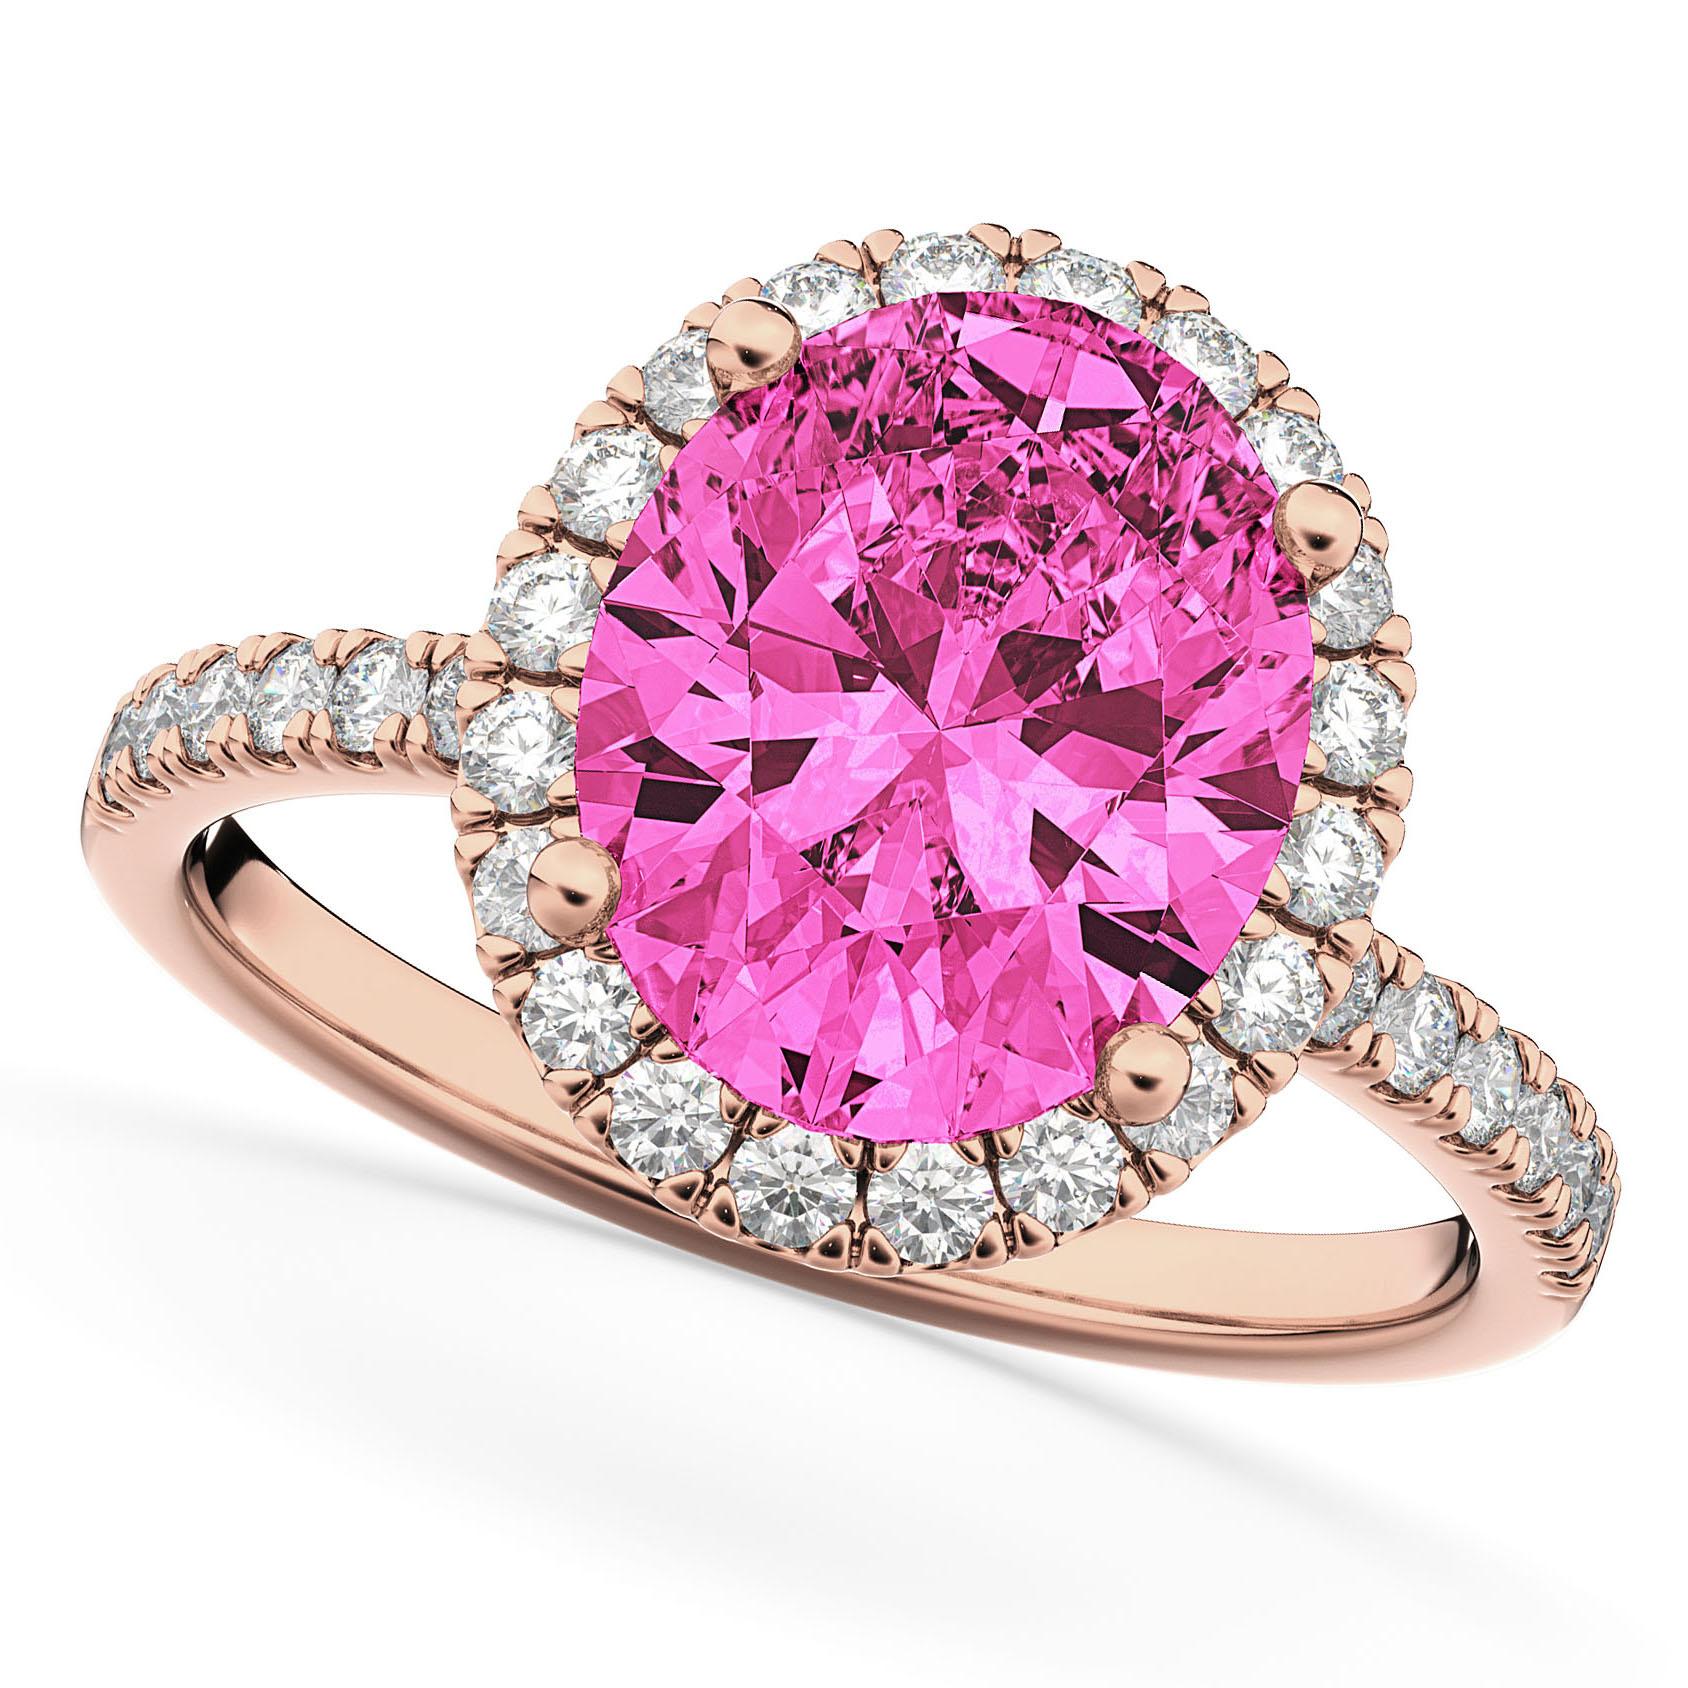 Oval Cut Halo Pink Tourmaline & Diamond Engagement Ring 14K Rose Gold 3.41ct